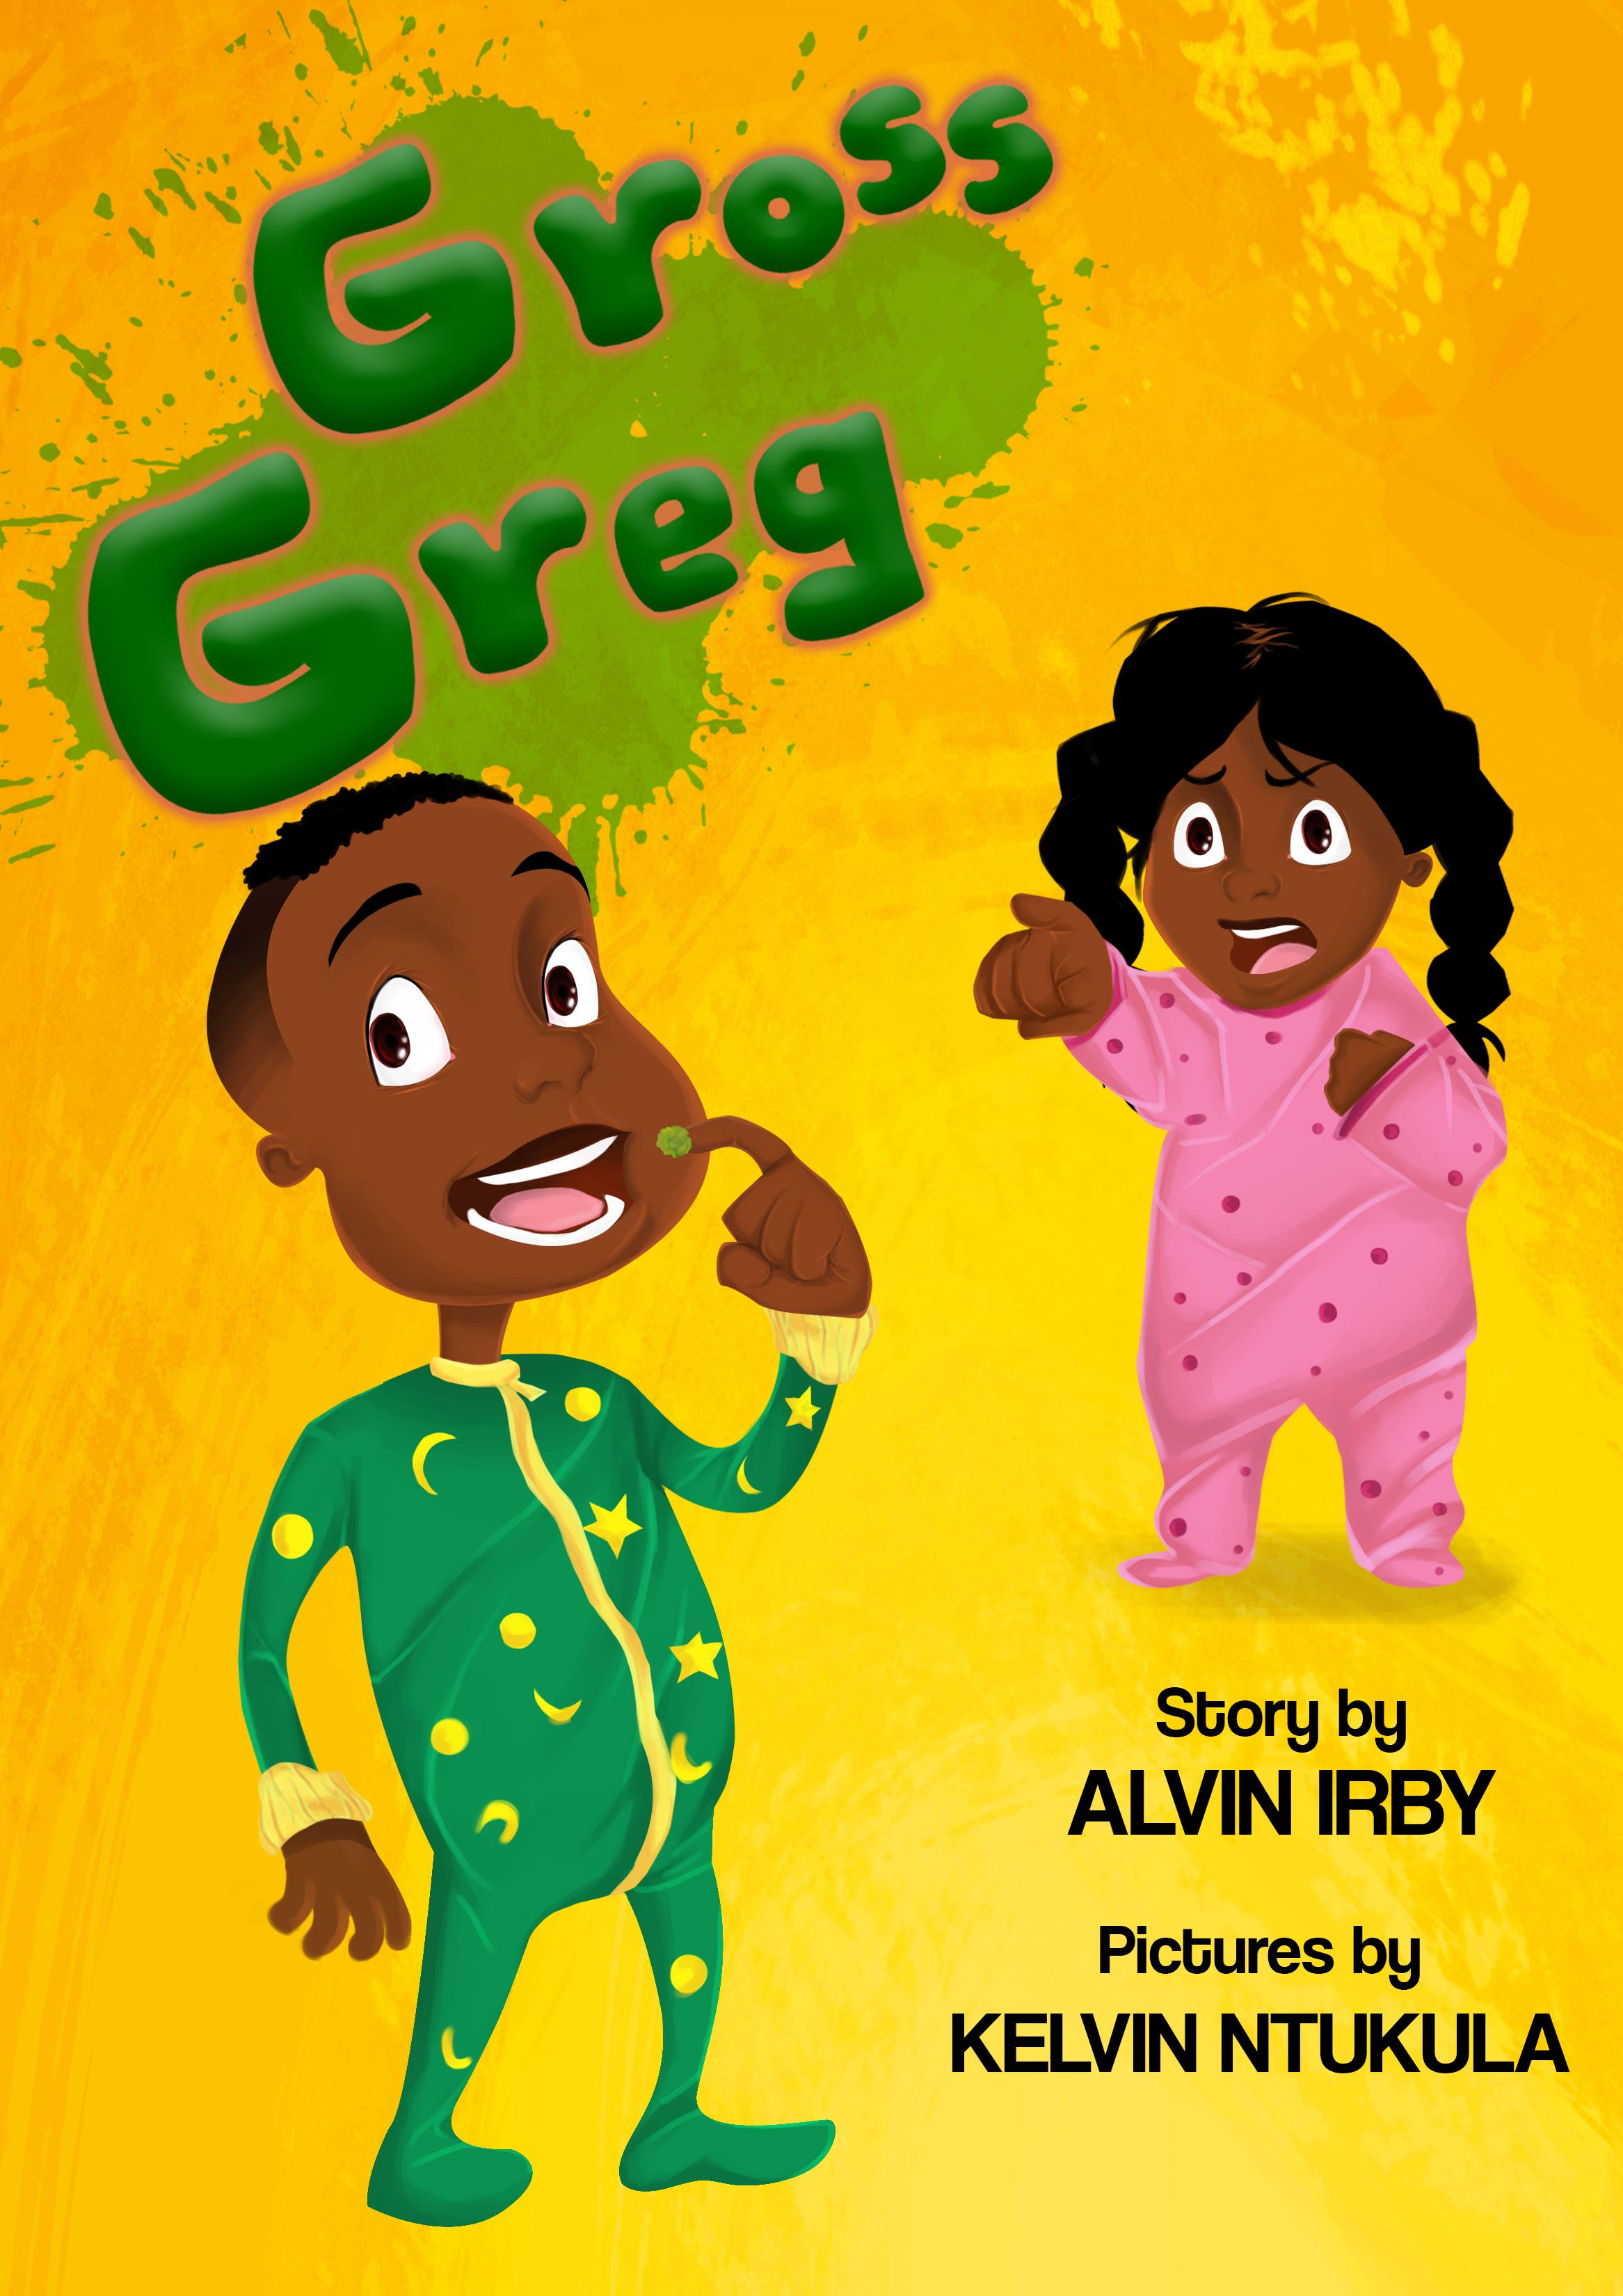 Gross Greg Book Cover